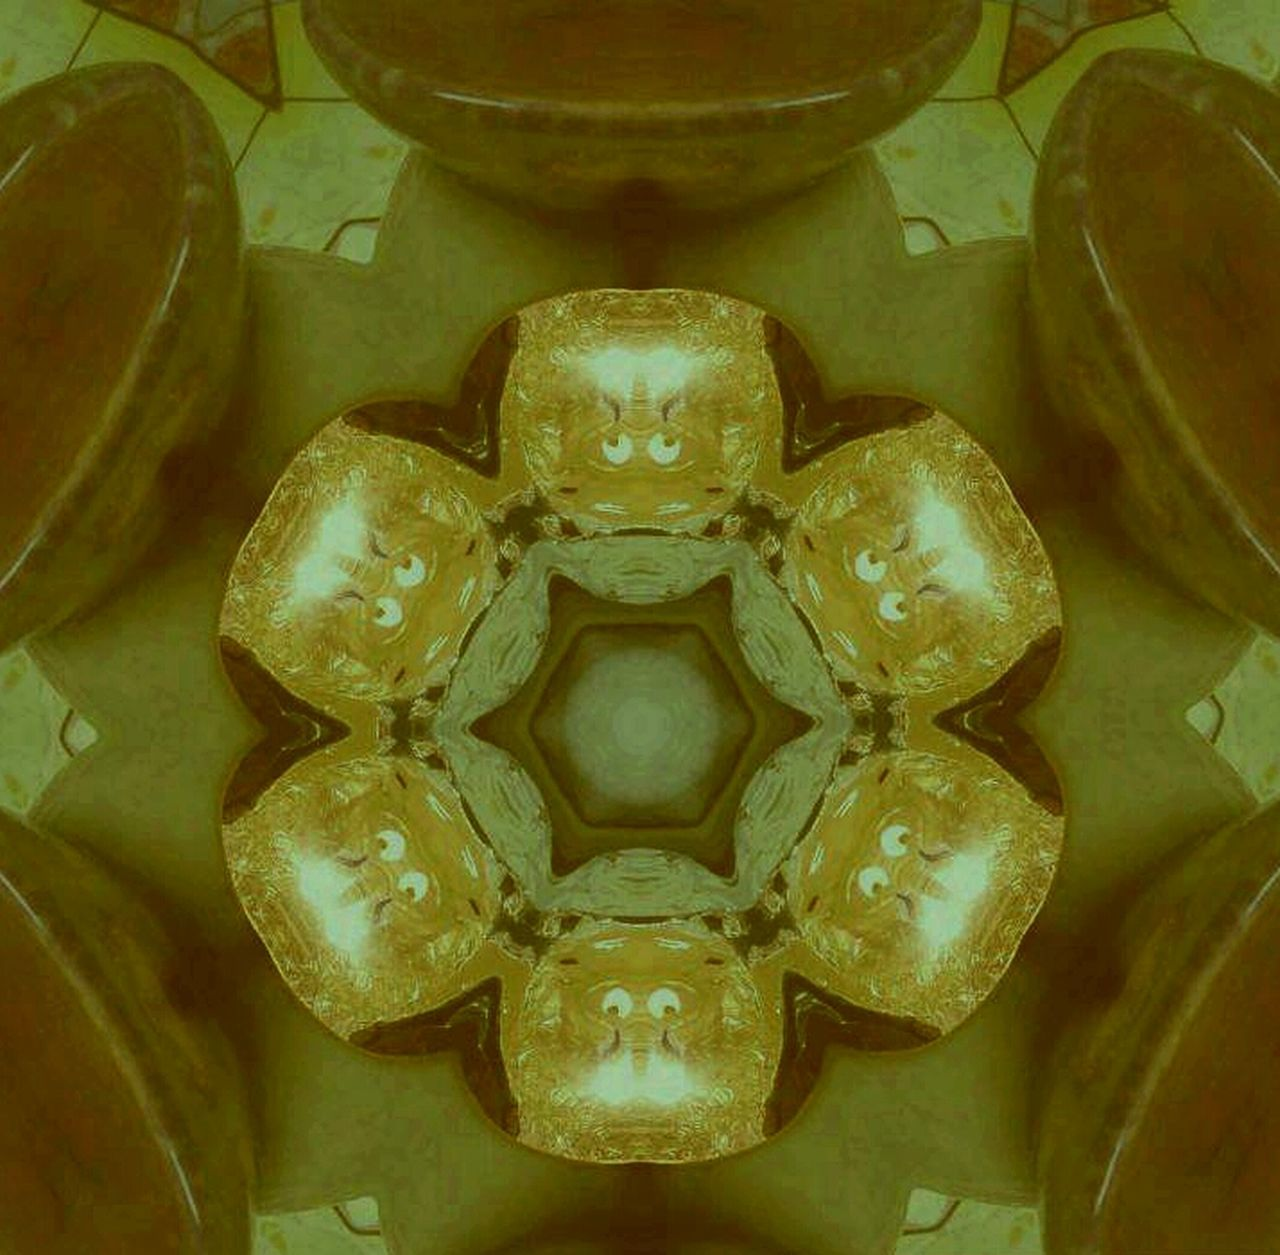 Luce Lux No People Indoors  Art Artartart Close-up Artartistic Day Full Frame Close-up Backgrounds No People Indoors  Day